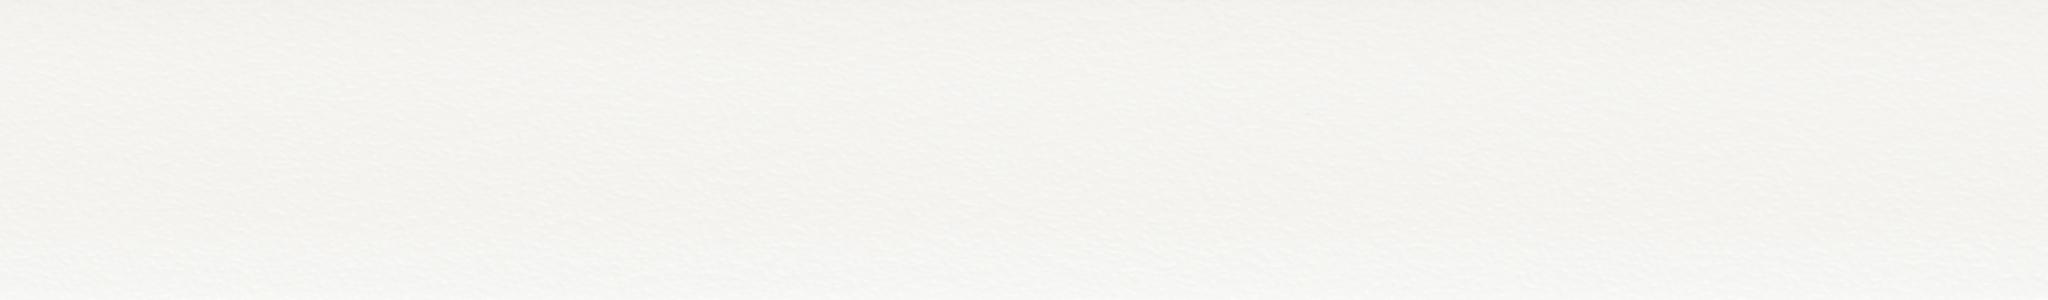 HU 17775 ABS Kante UNI Grau Weiß perl 101